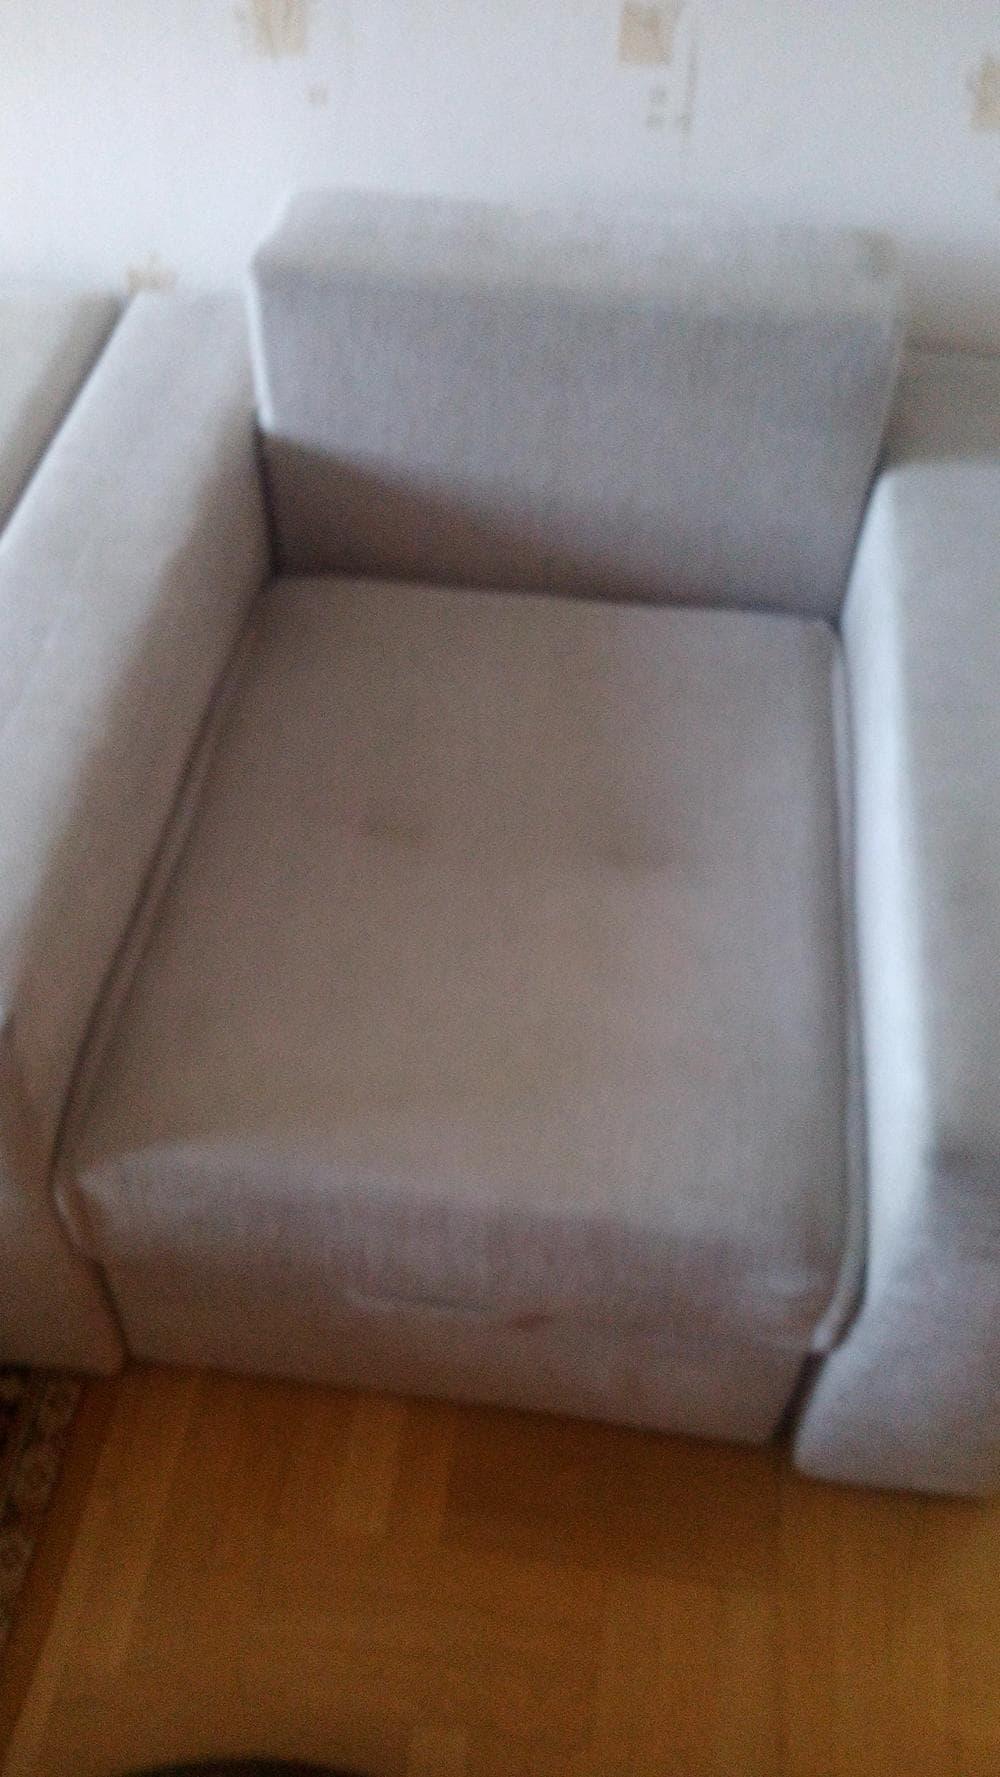 кресло после уборки квартир